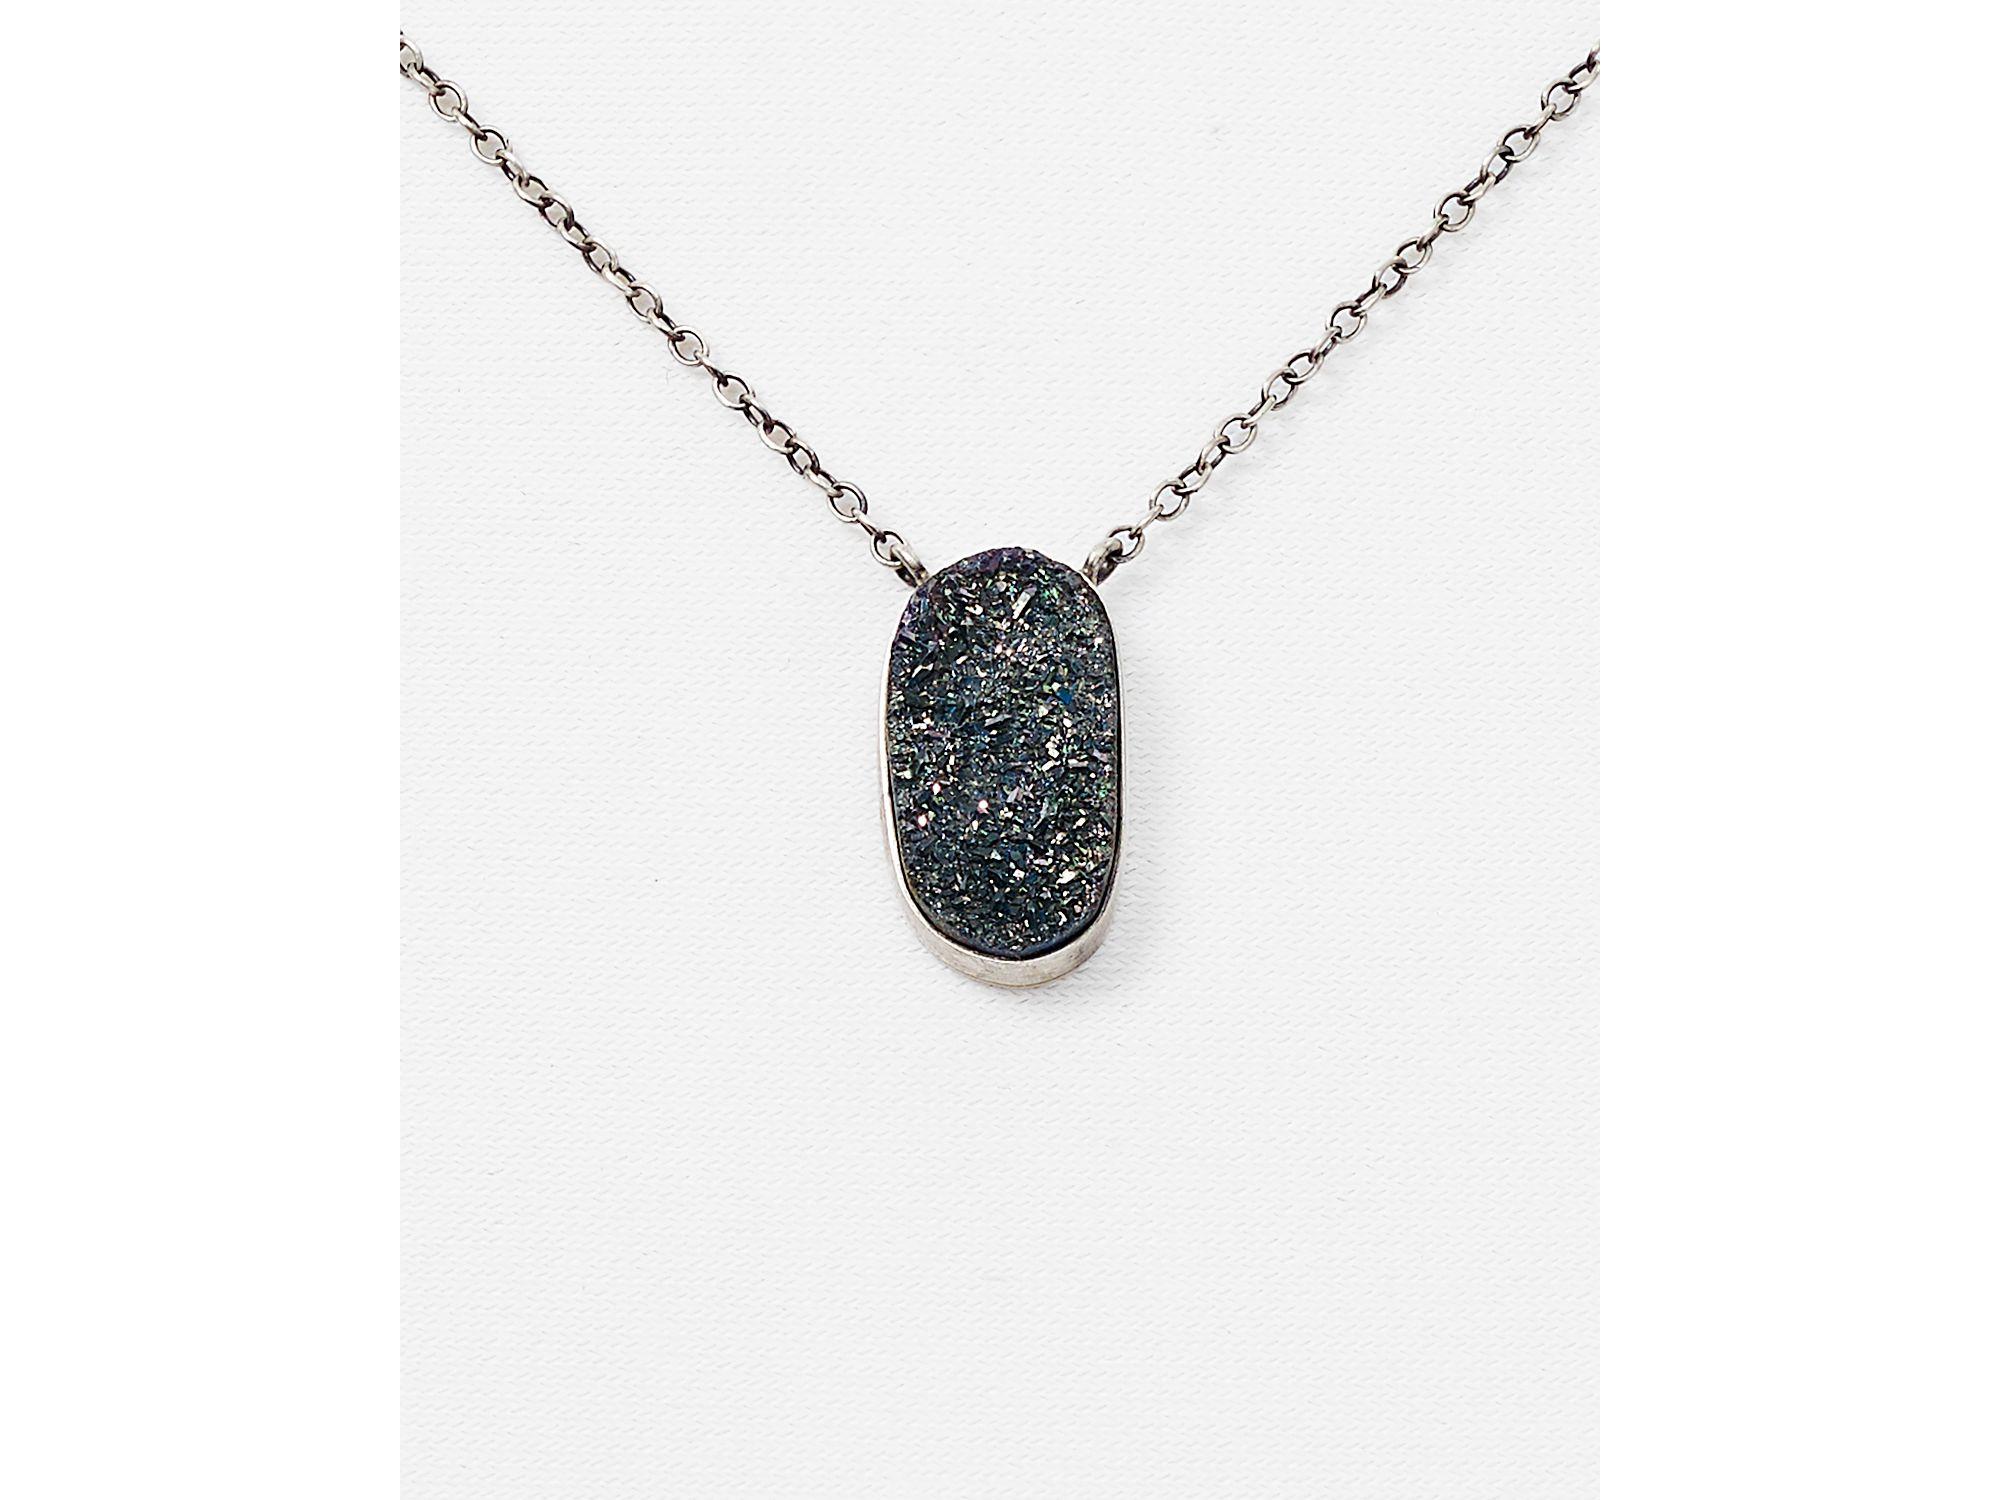 Lyst chan luu druzy agate pendant necklace 17 in metallic gallery aloadofball Choice Image